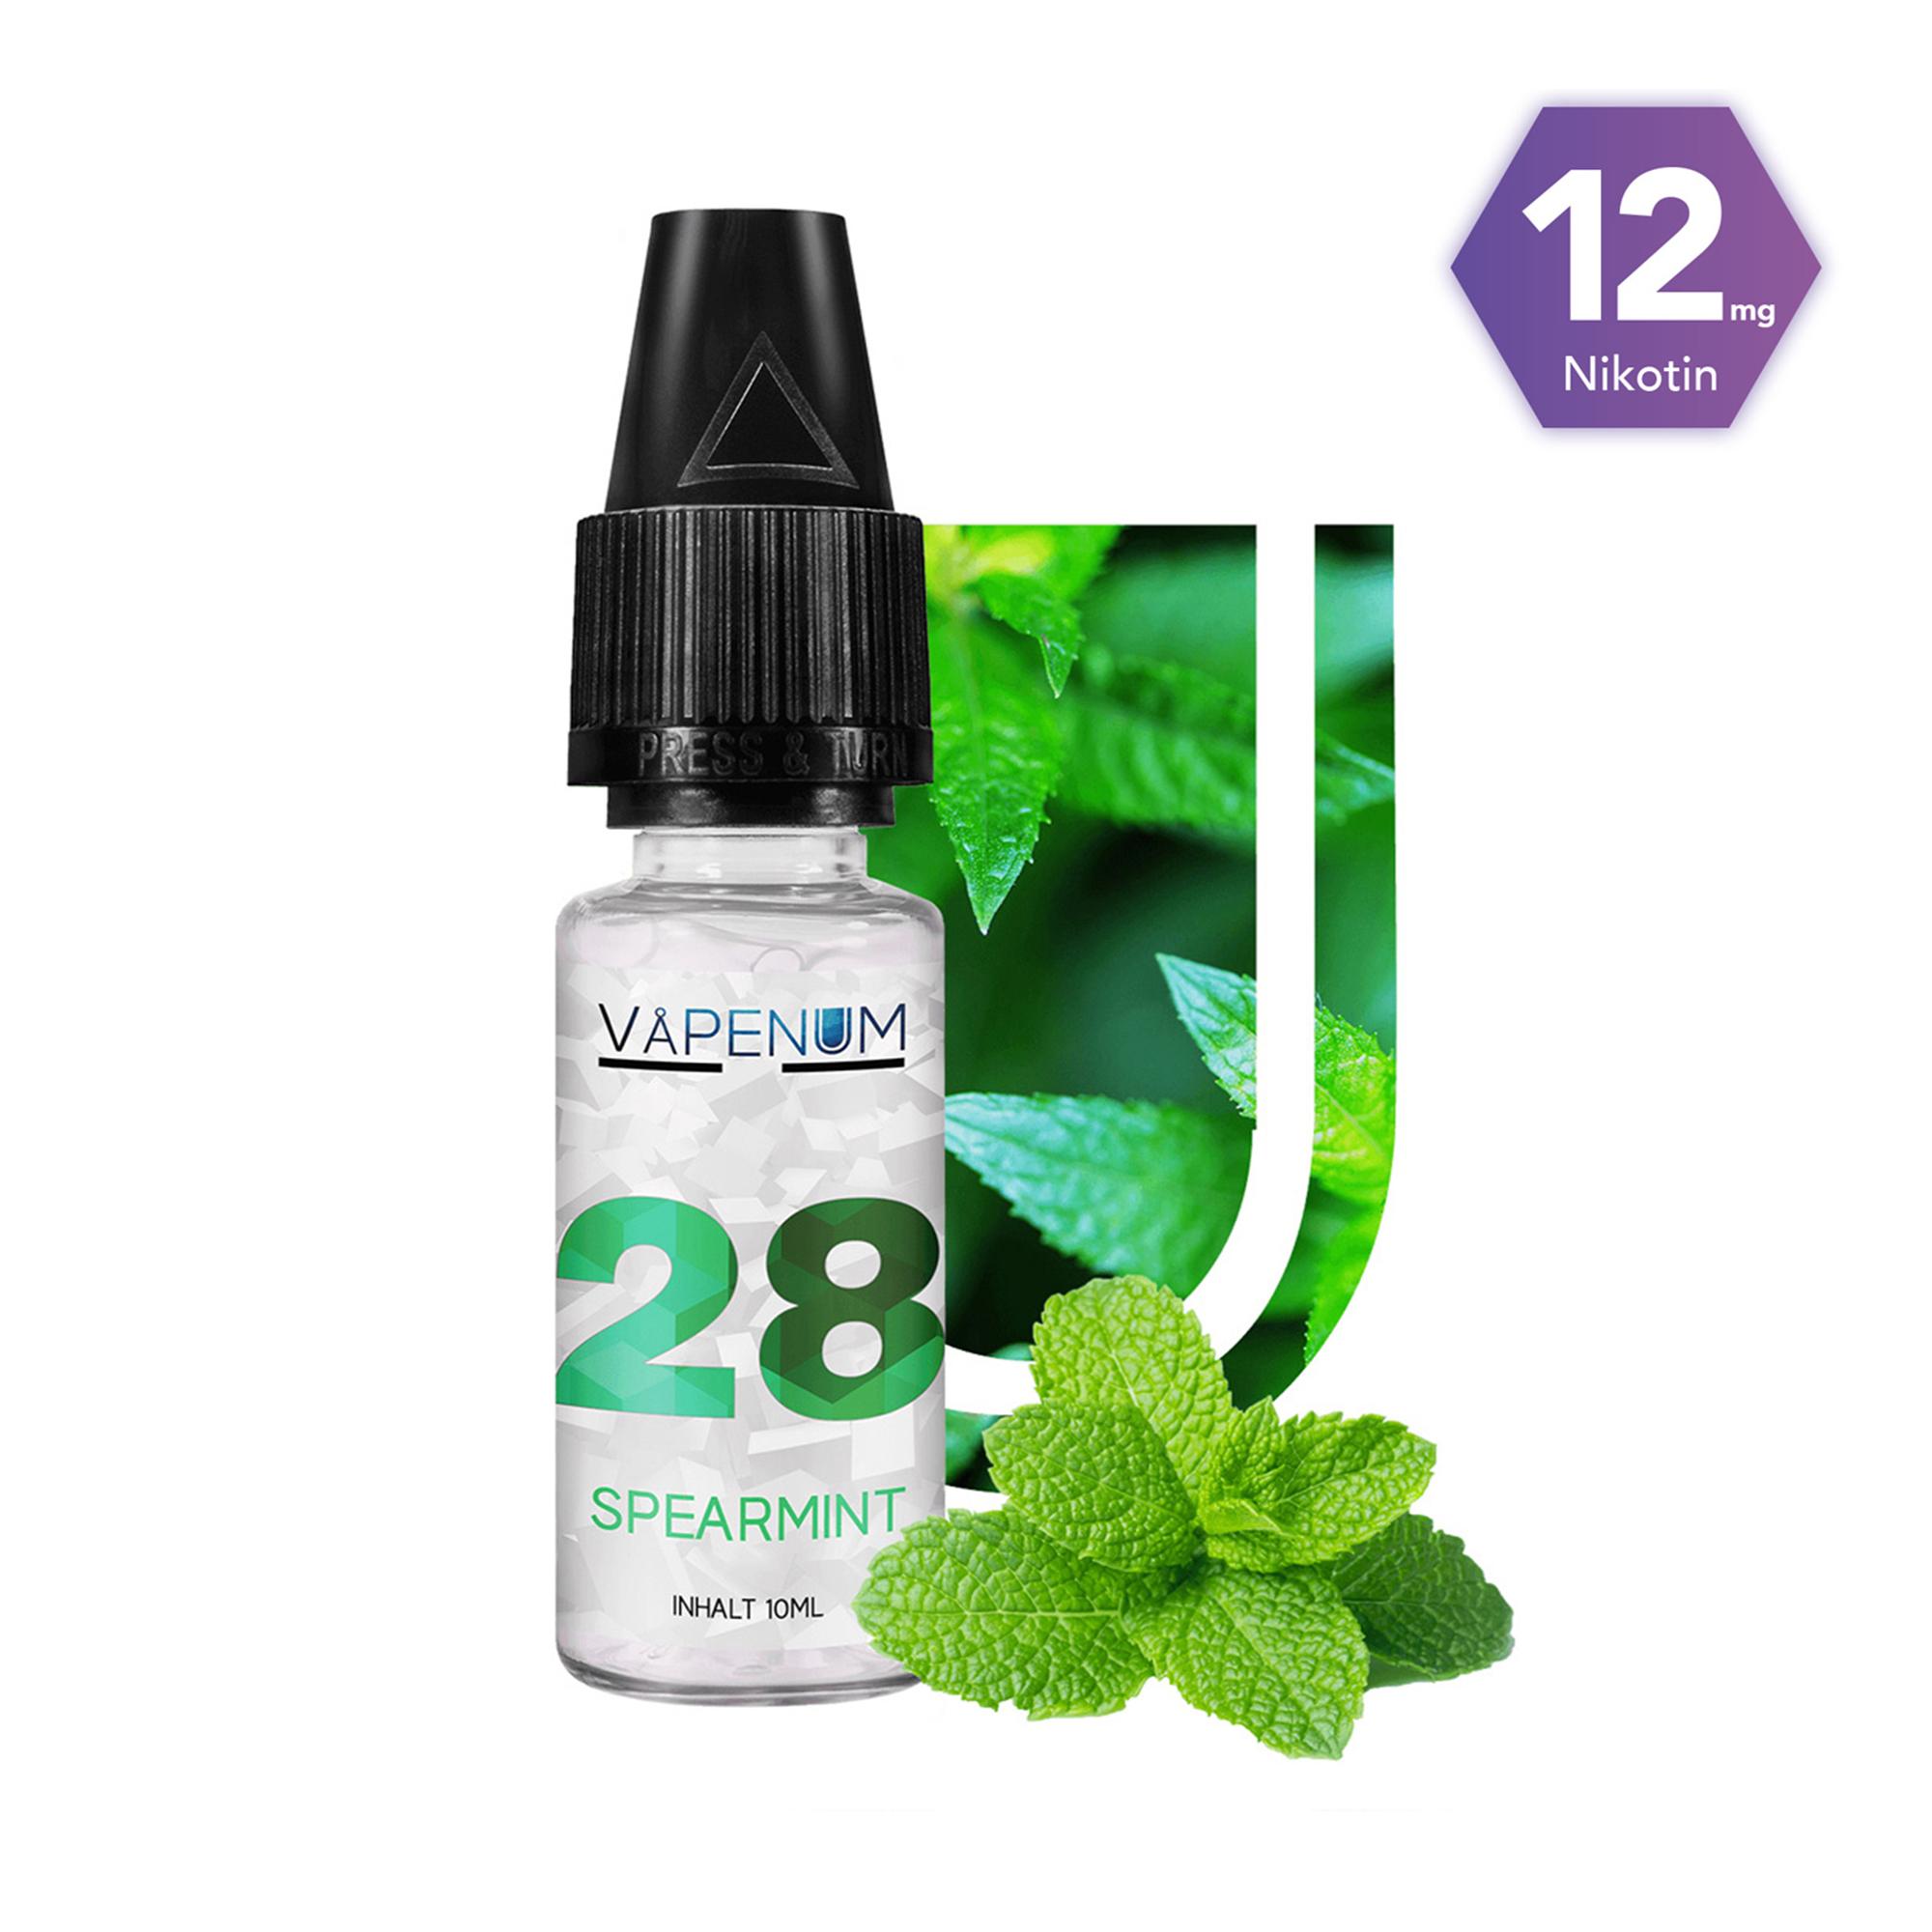 28 - Spearmint Liquid by Vapenum 12mg